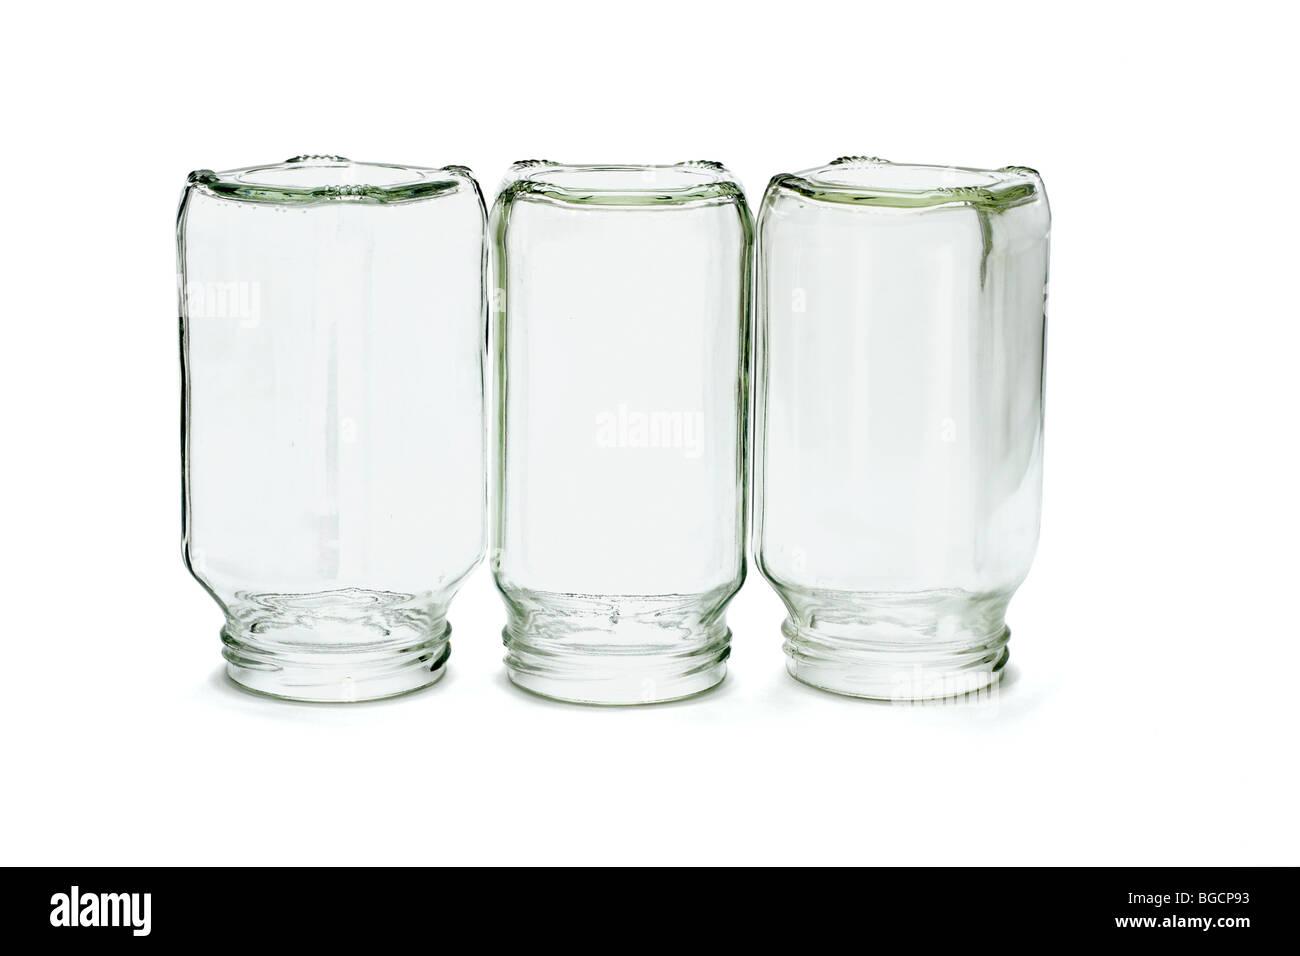 Three glass bottles inverted on white background - Stock Image